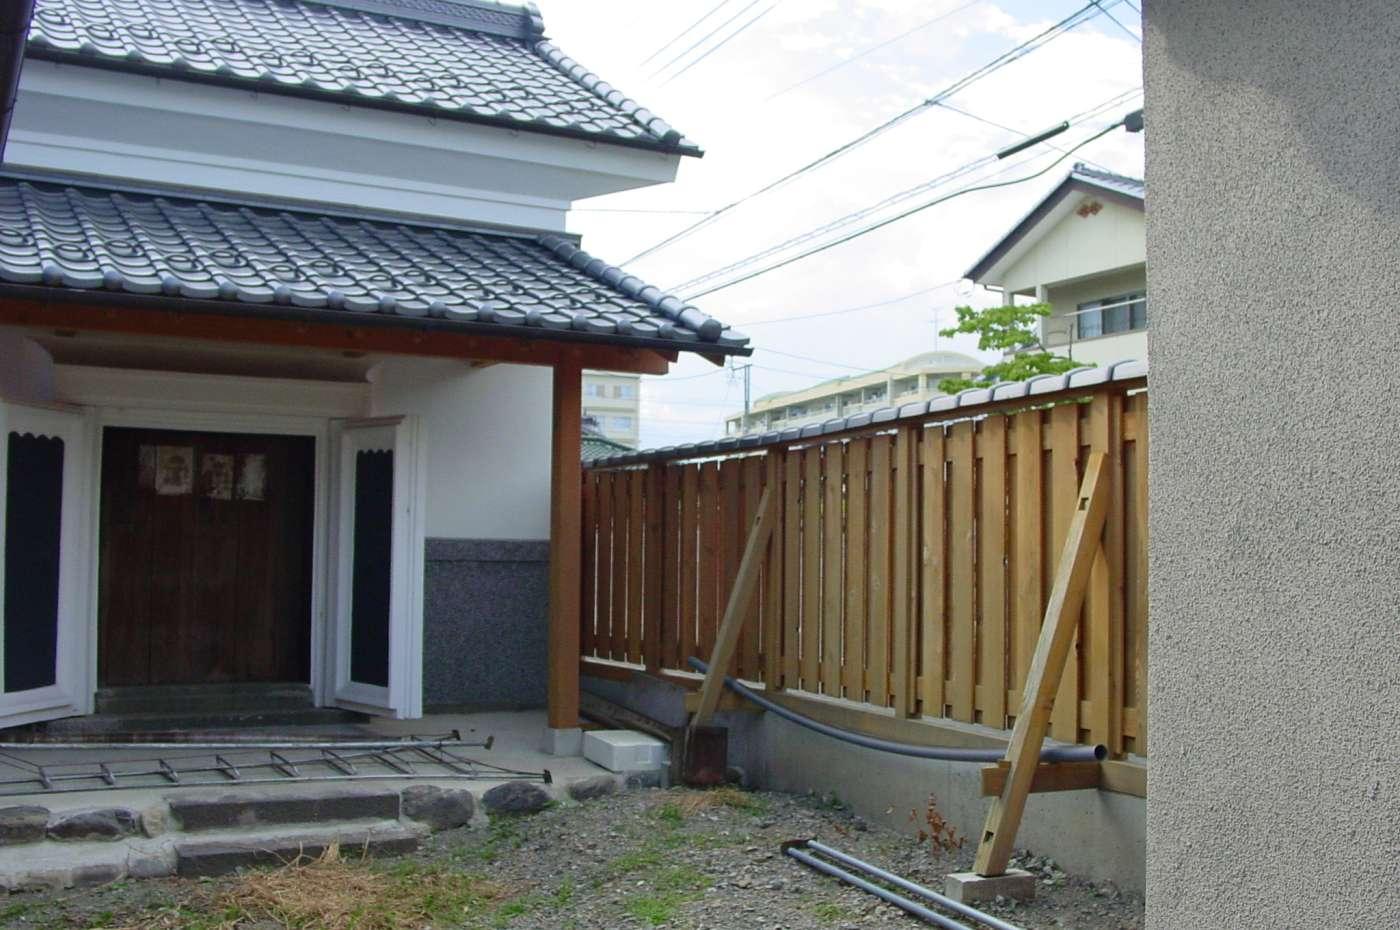 http://sumainomatsuki.com/folder1/DSC02428.JPG